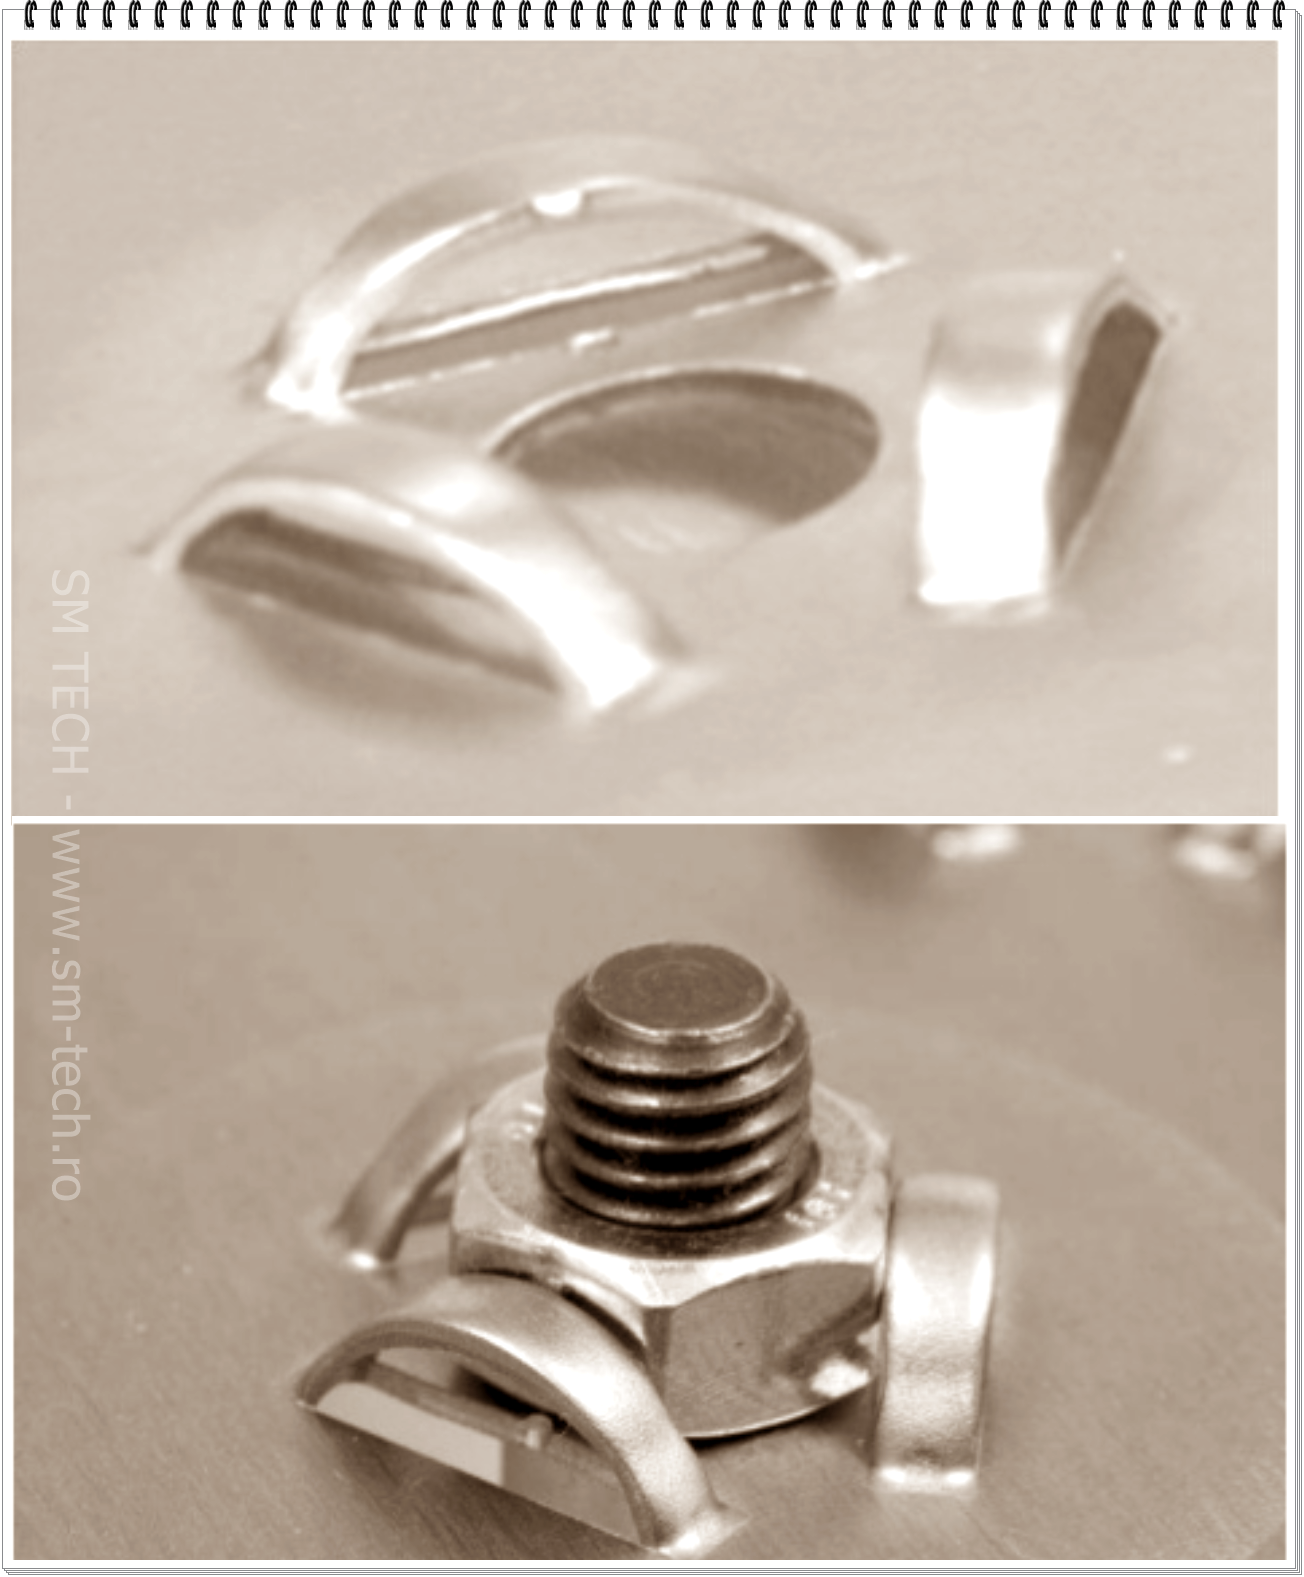 Scula Triple Bridge Pentru Deformare Blocare Piulita Disponibila In Varianta Trumpf Si Thick Turret Metal Sheet Design Sheet Metal Fabrication Metal Design